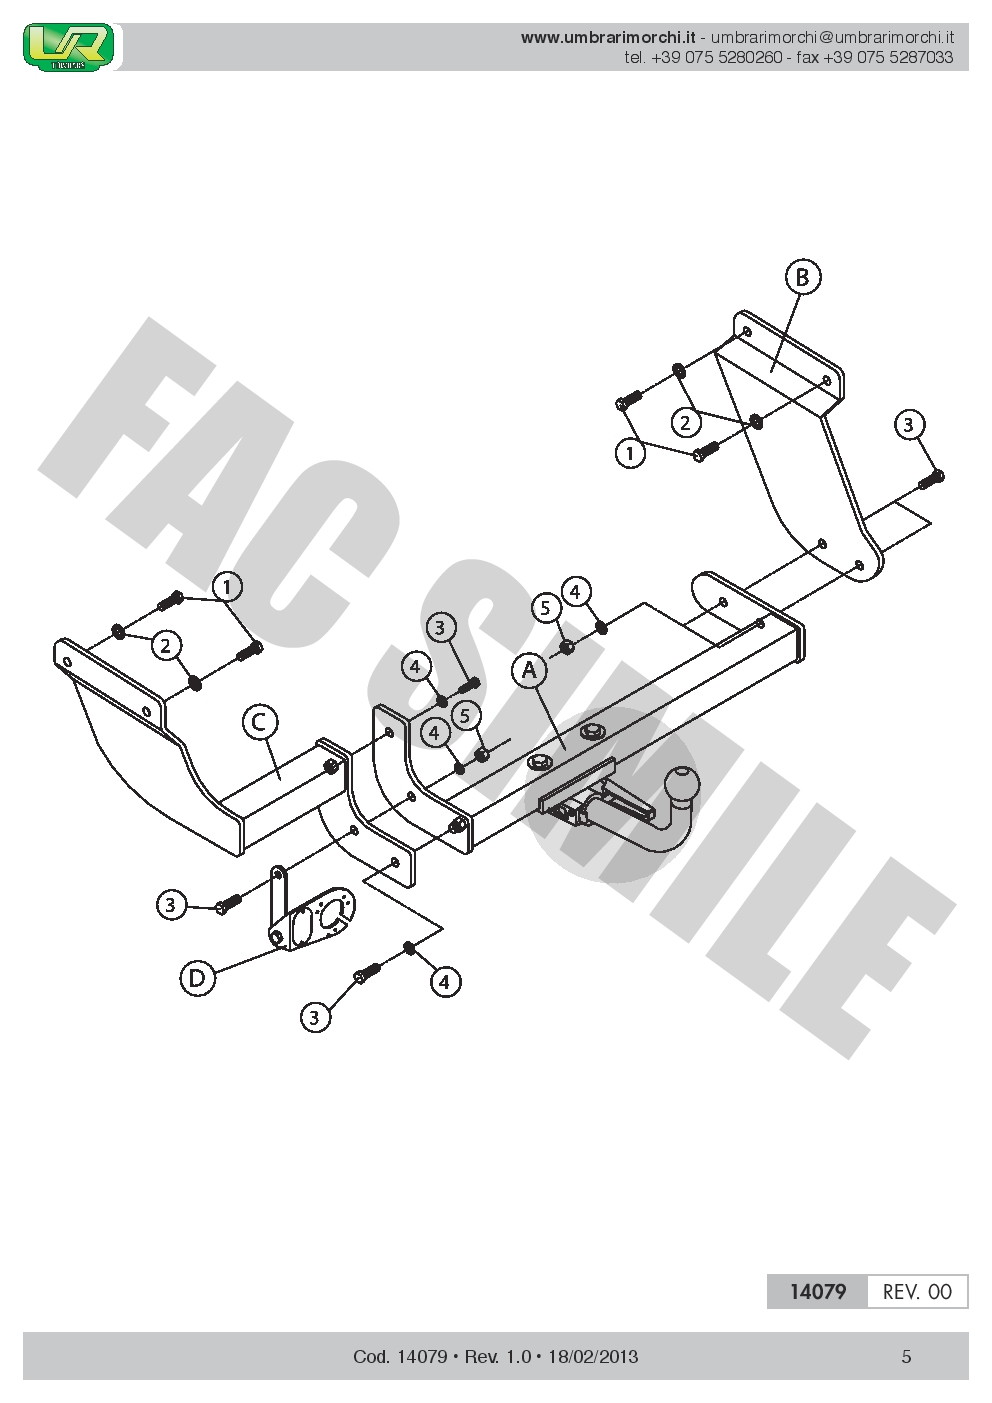 AHK Abnehmbare Anhängerkupplung 13p E-Satz Ford Transit Connect SL 02-12 14079B1